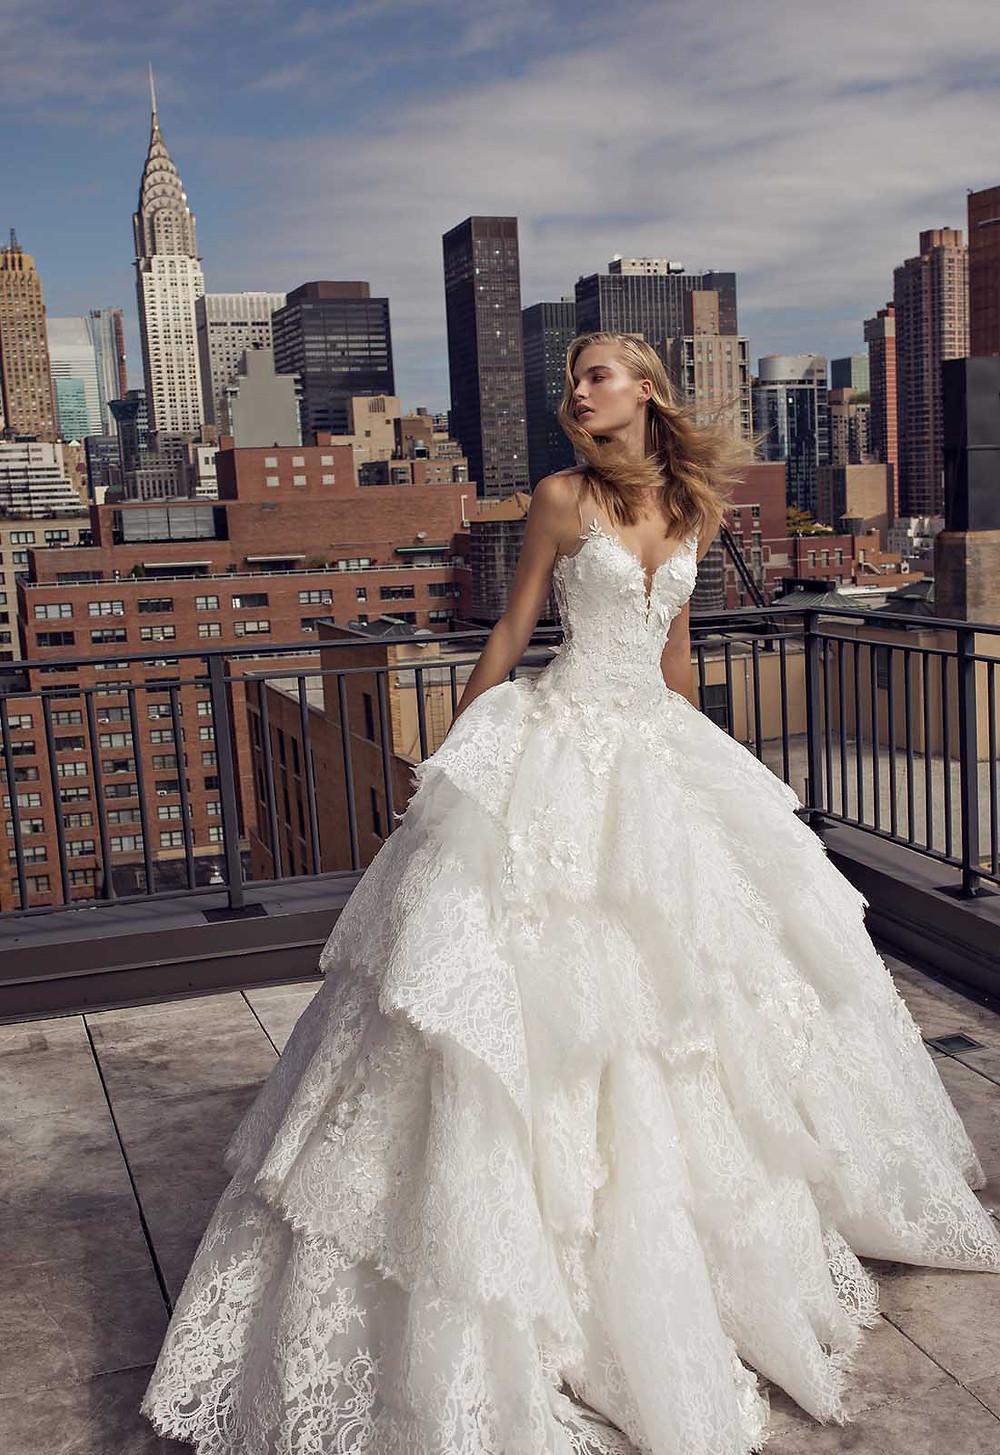 A Pnina Tornai lace princess ball gown wedding dress with a layered ruffle skirt